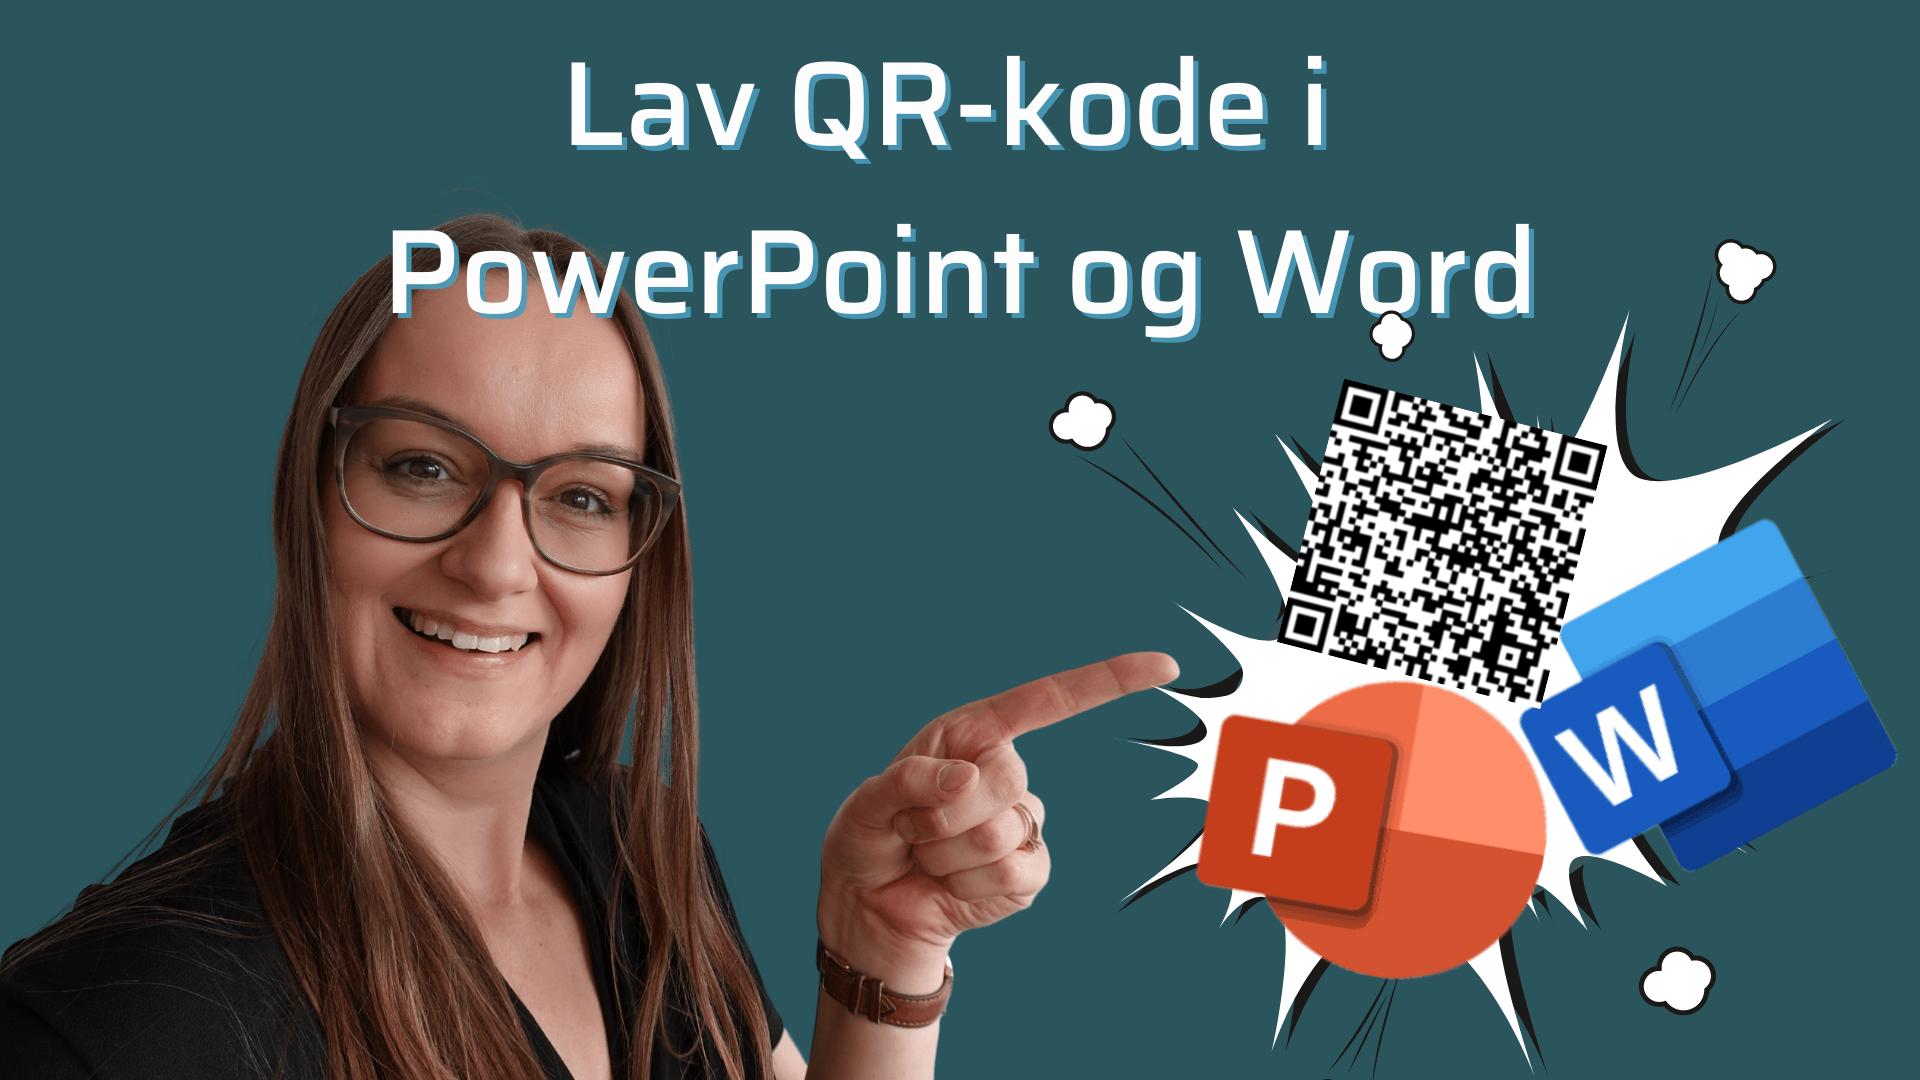 LAv en gratis QR kode i Powerpoint eller word